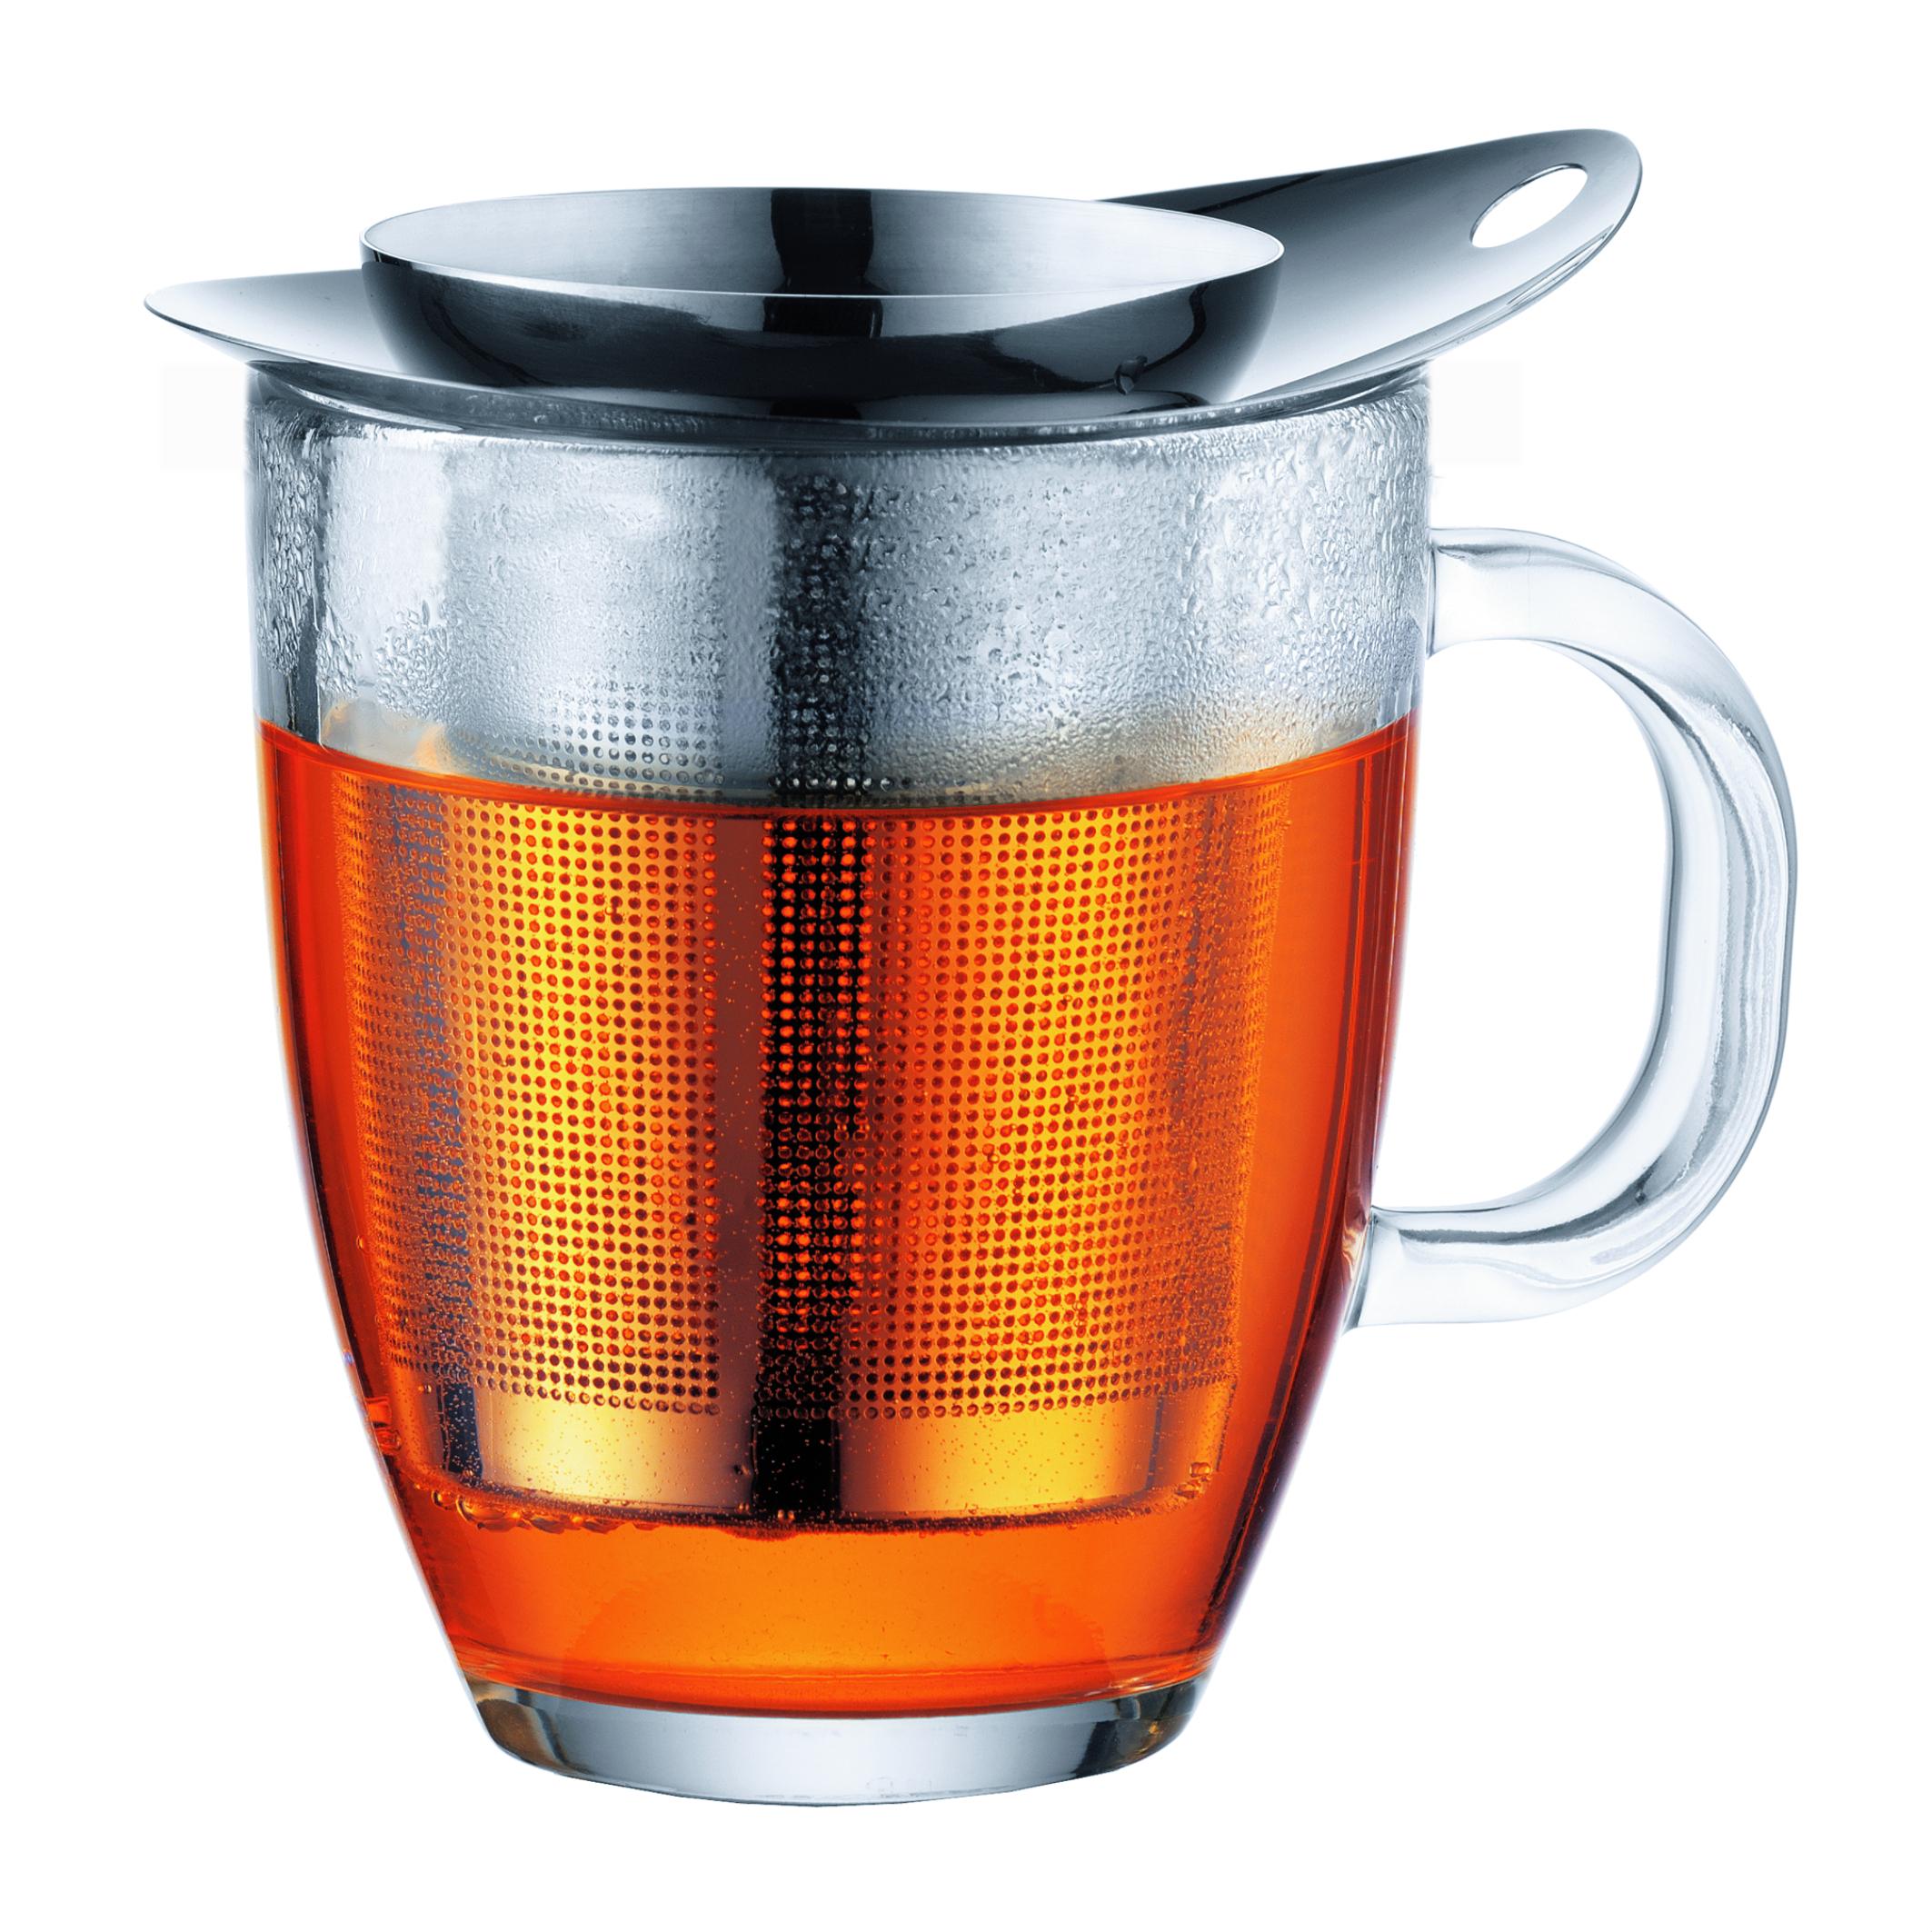 bodum - new yo-yo set set mug en verre, filtre en inox brillant